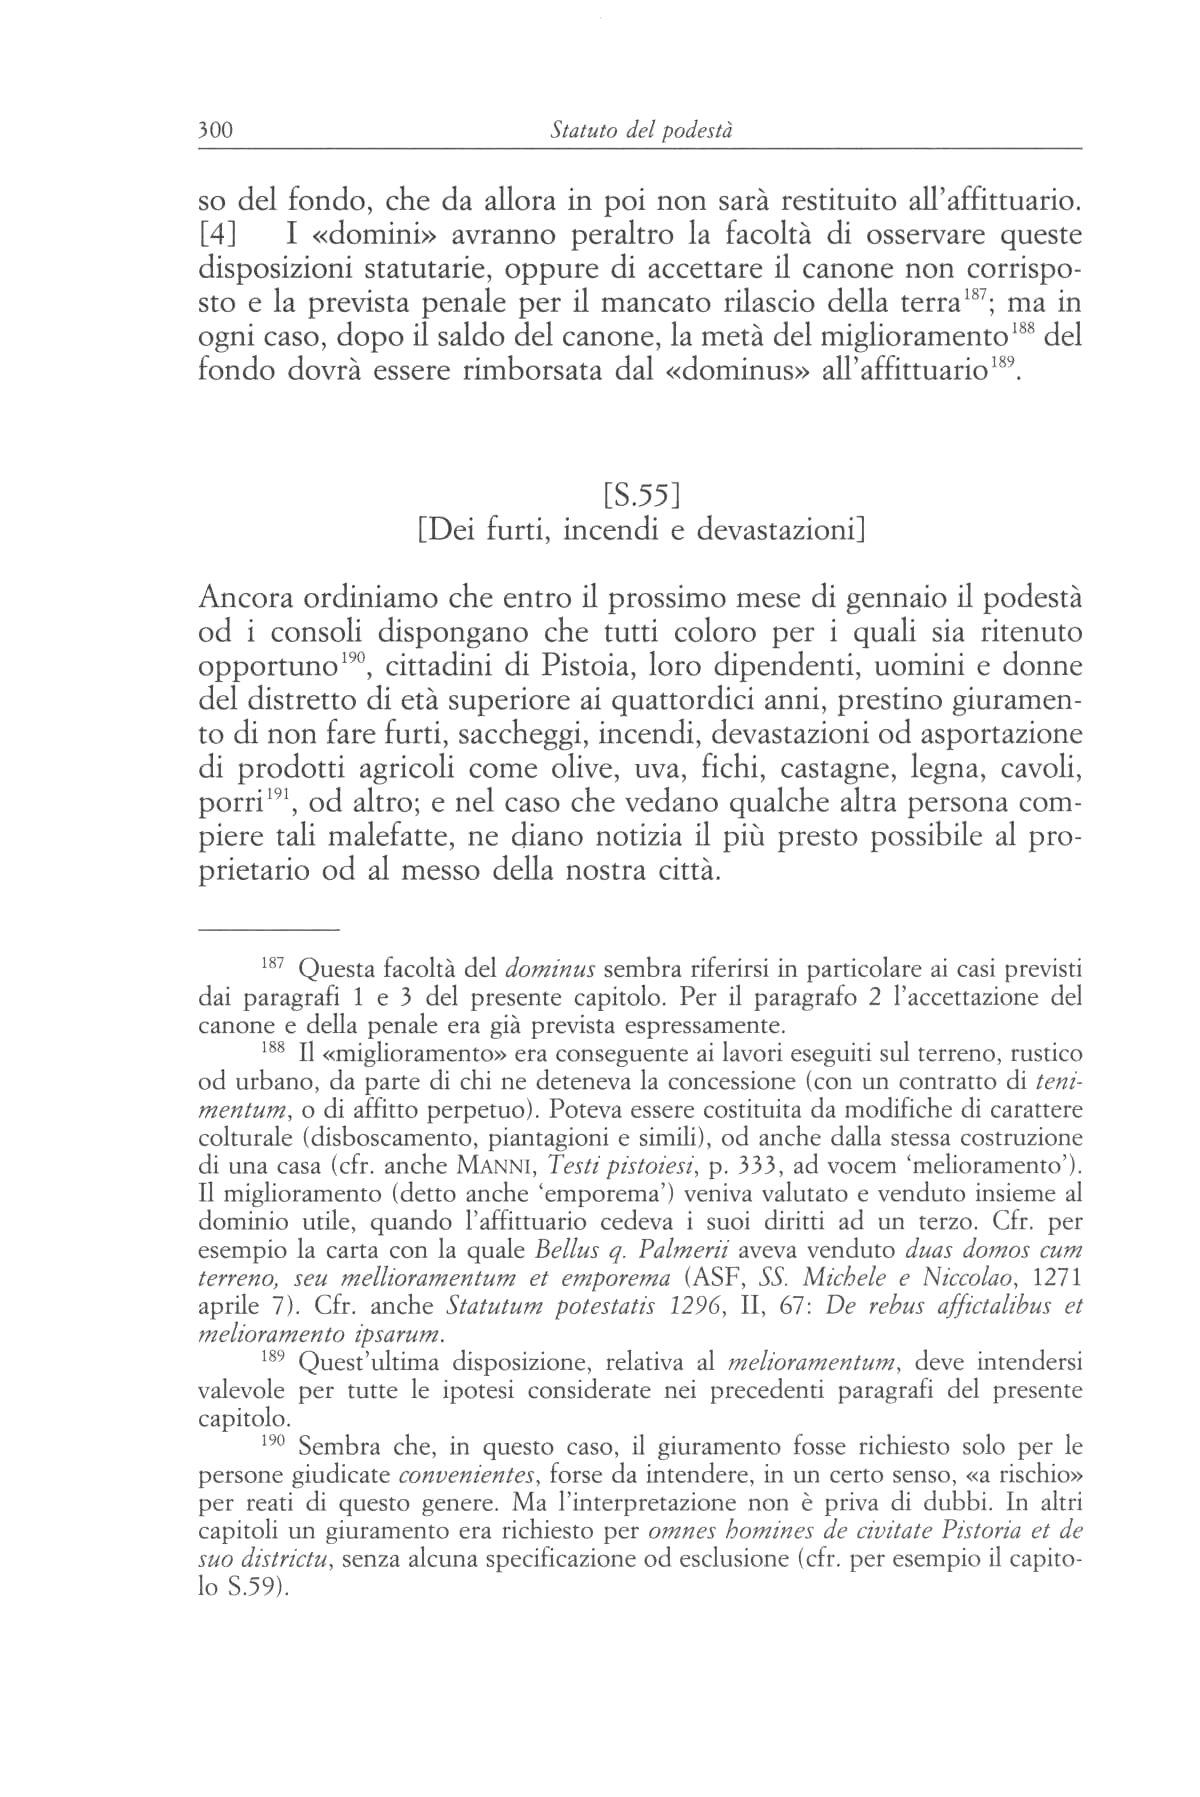 statuti pistoiesi del sec.XII 0300.jpg